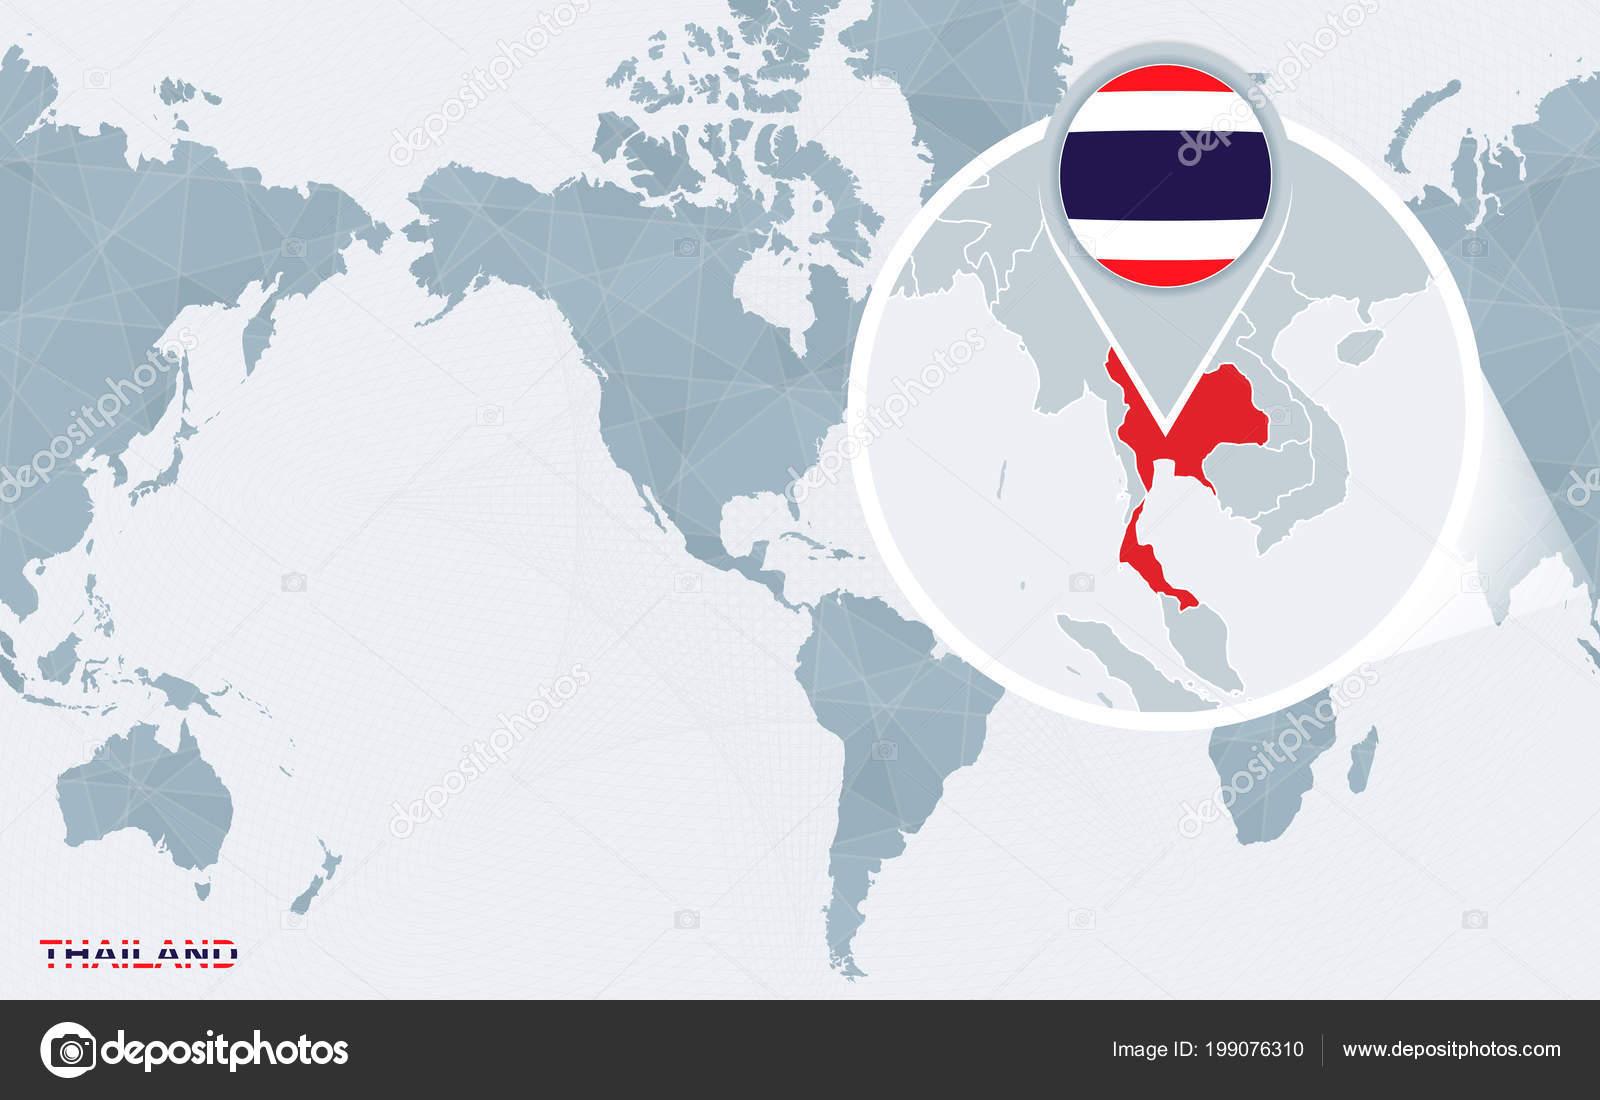 Thajsko Raj Pisecnych Plazi Ca Impuls Koprivnice